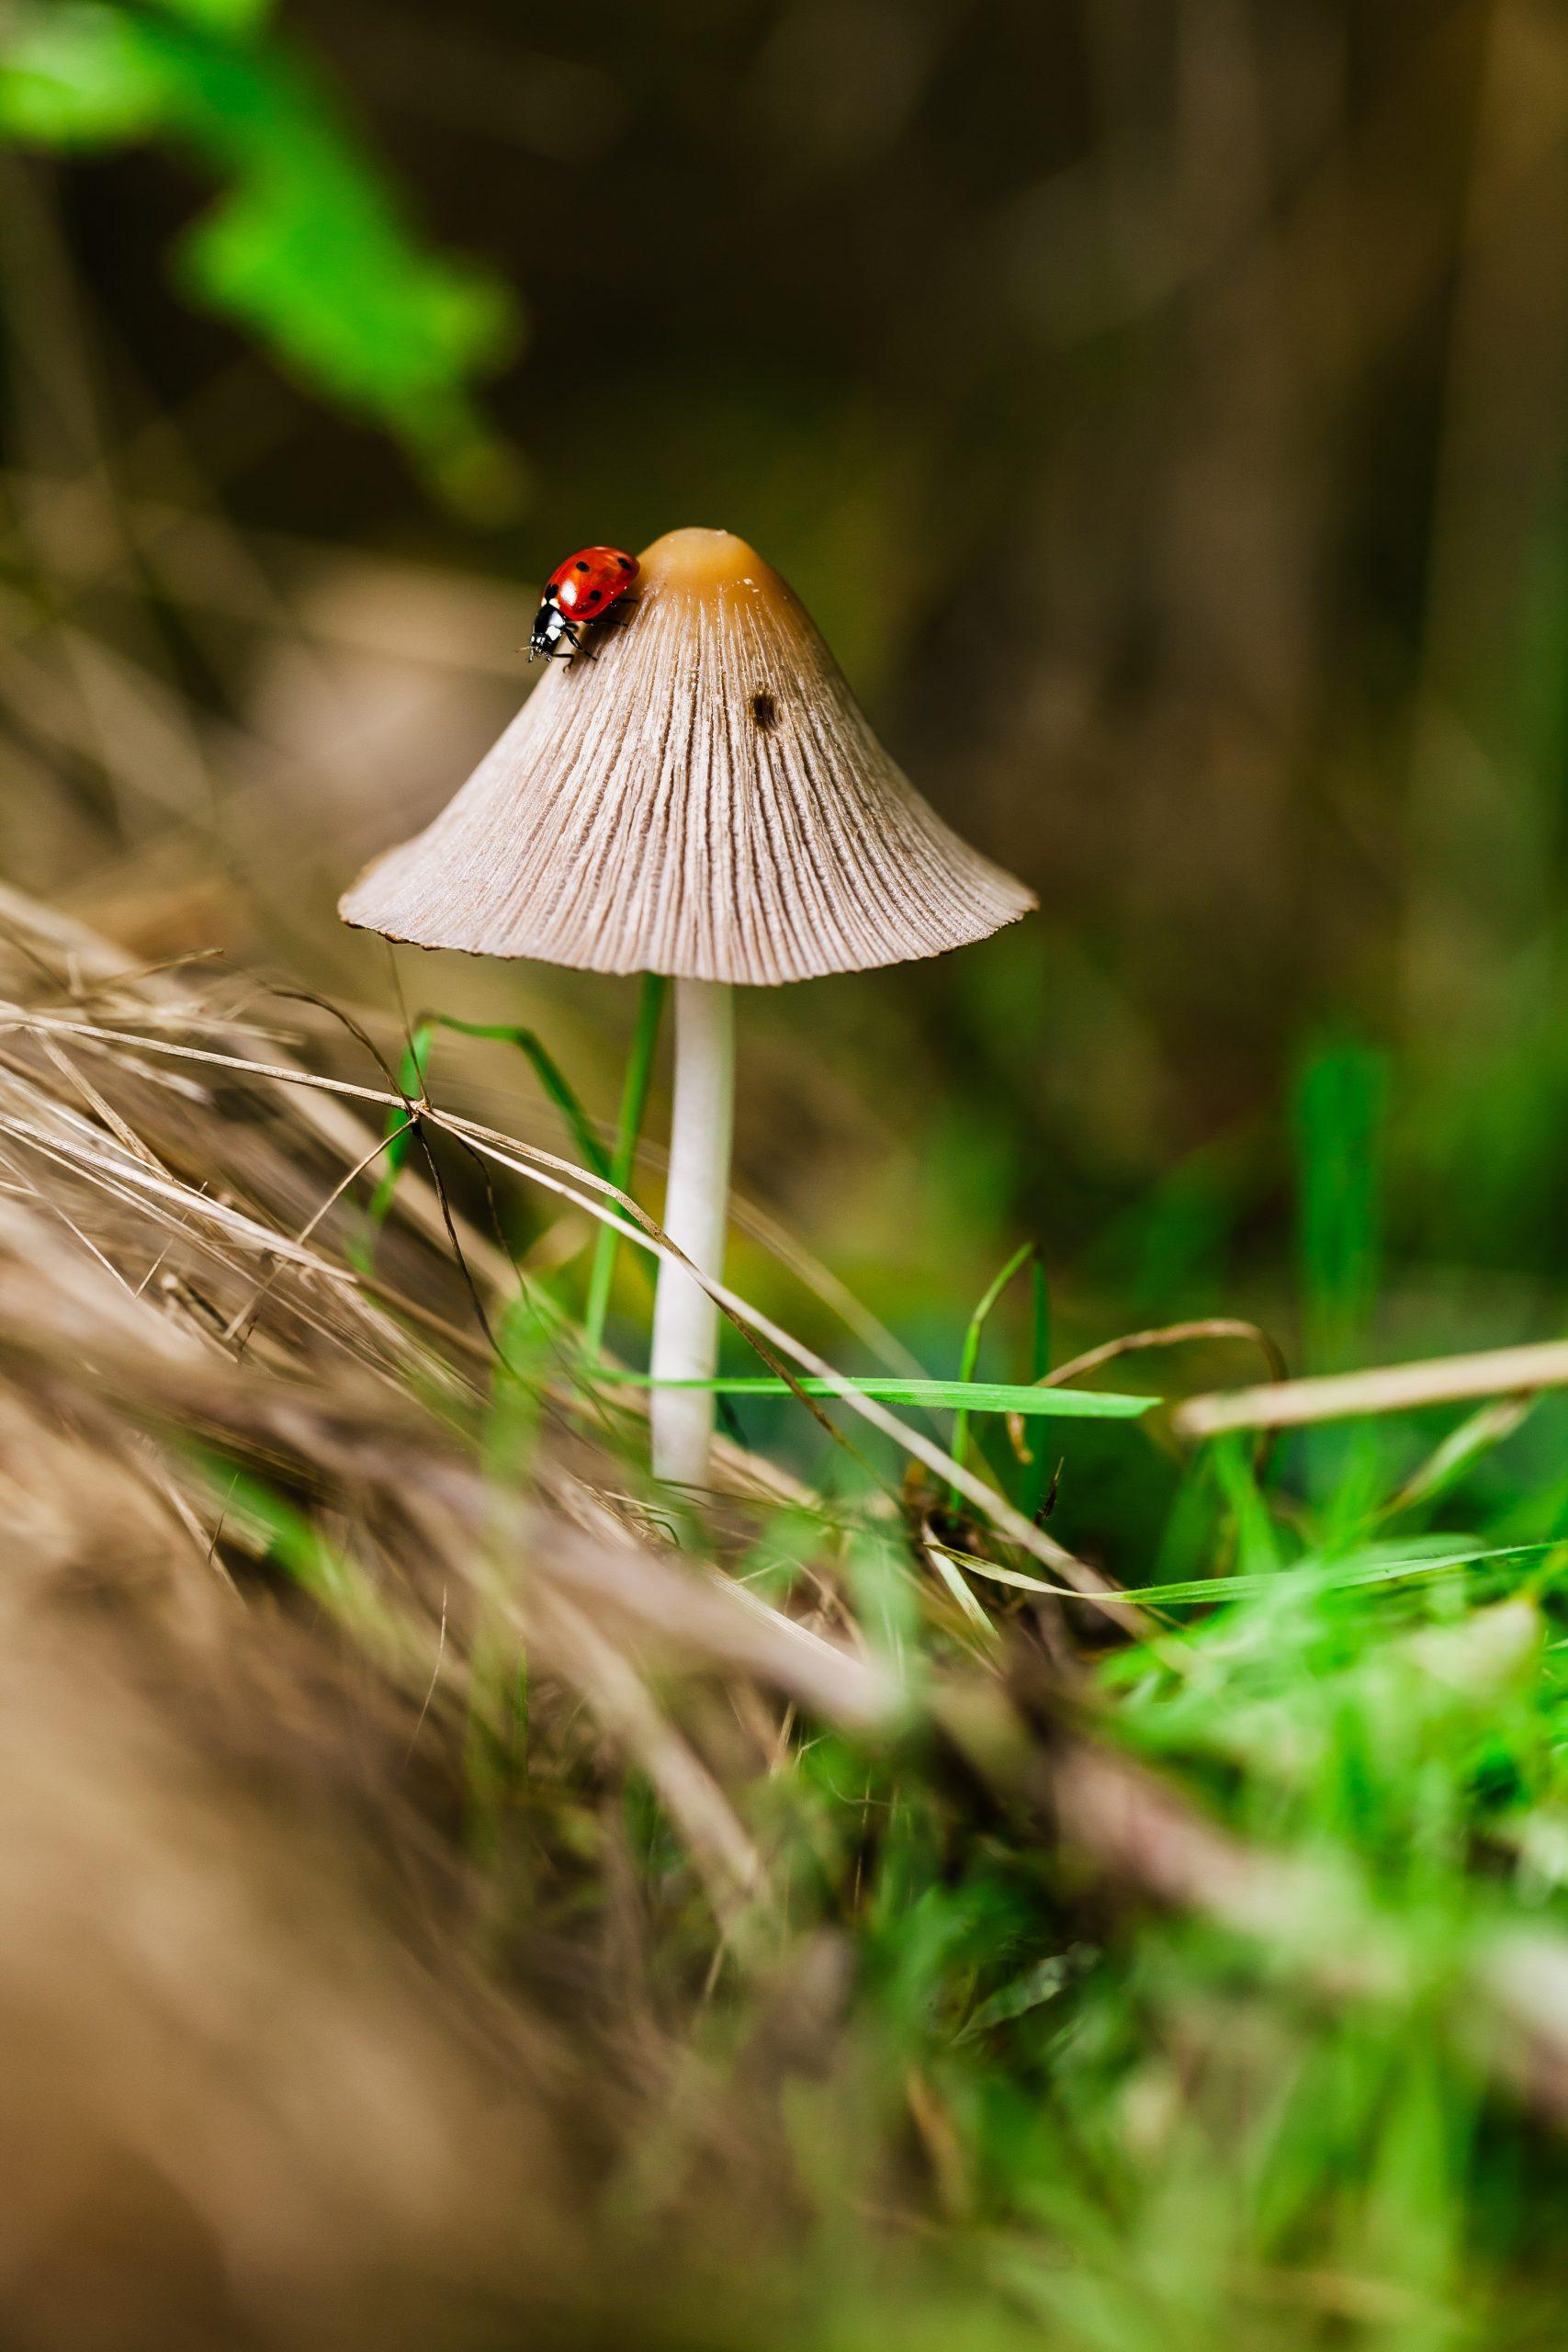 Image shows a ladbug perched on a mushroom.